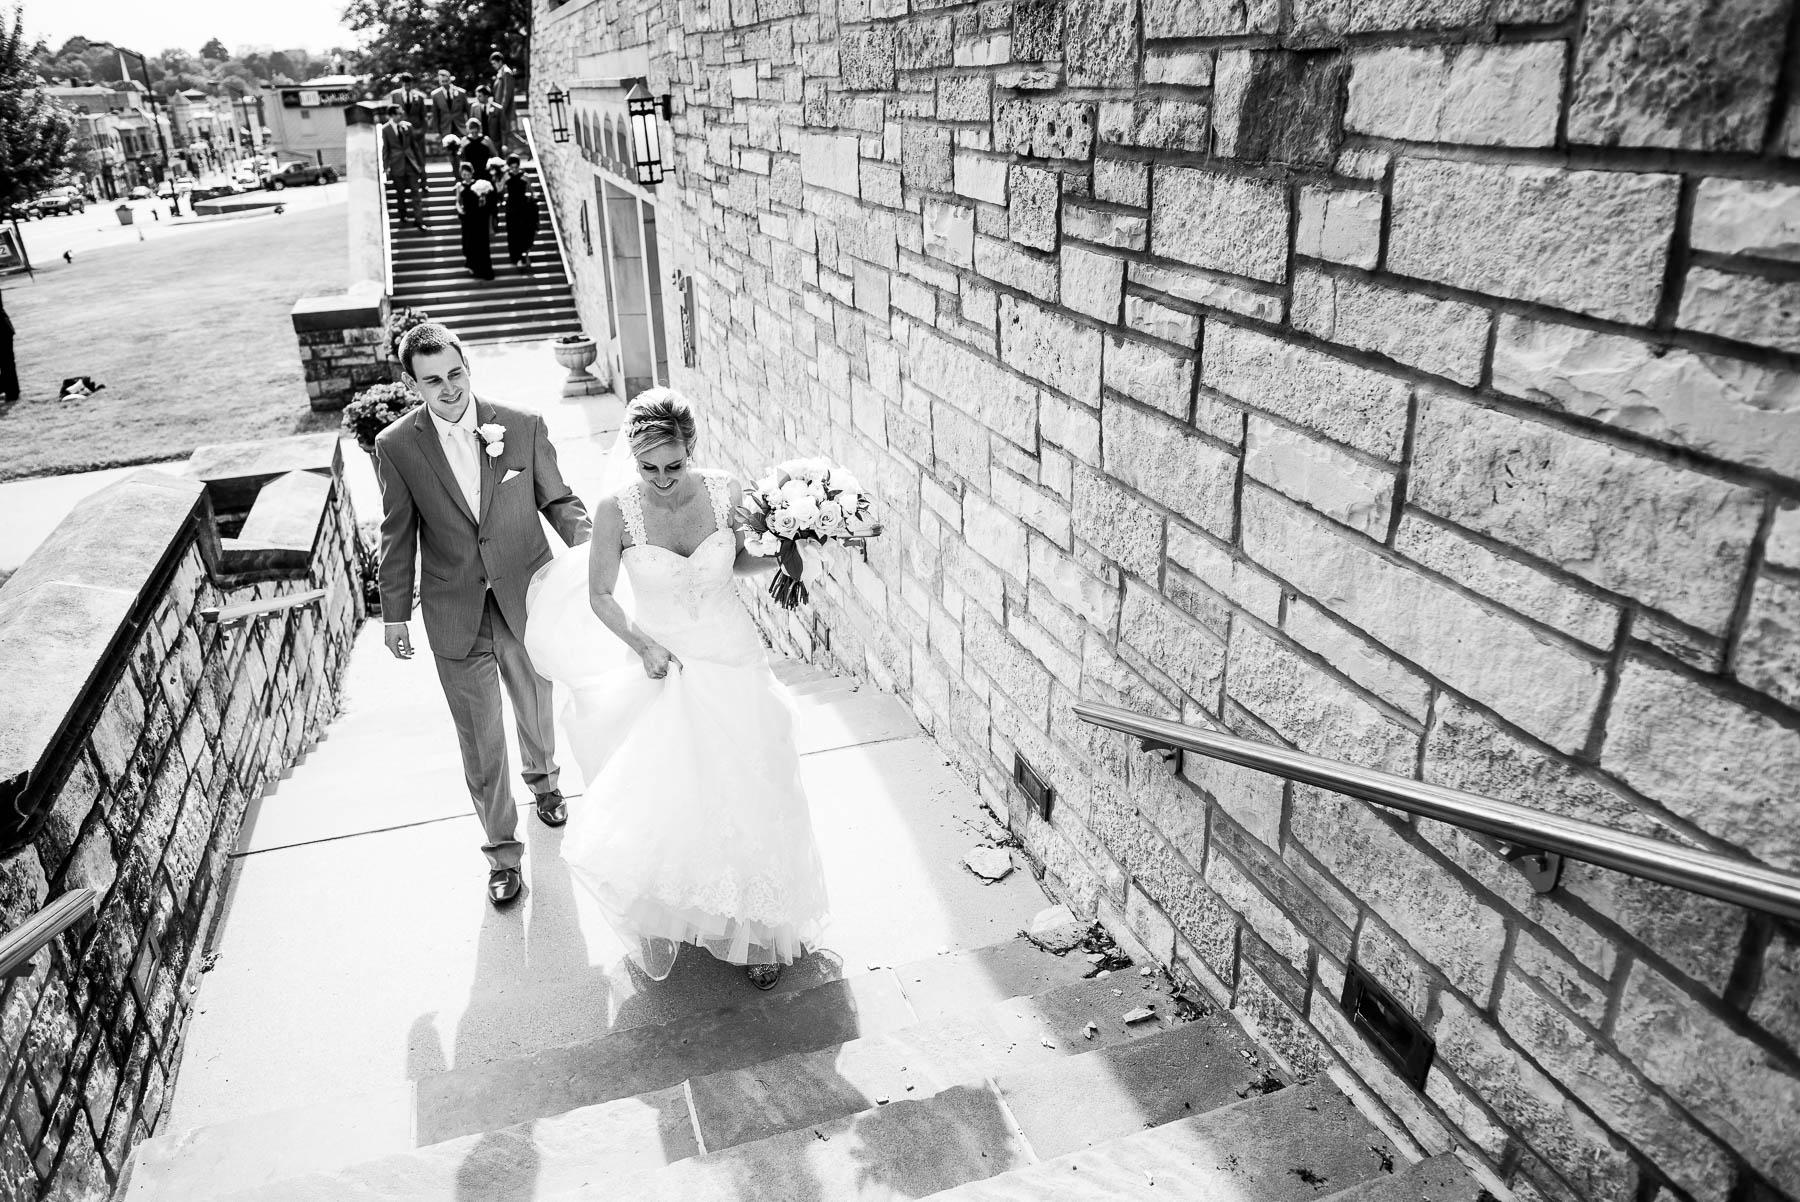 Bride and groom at Baker Memorial United Methodist Church in St. Charles